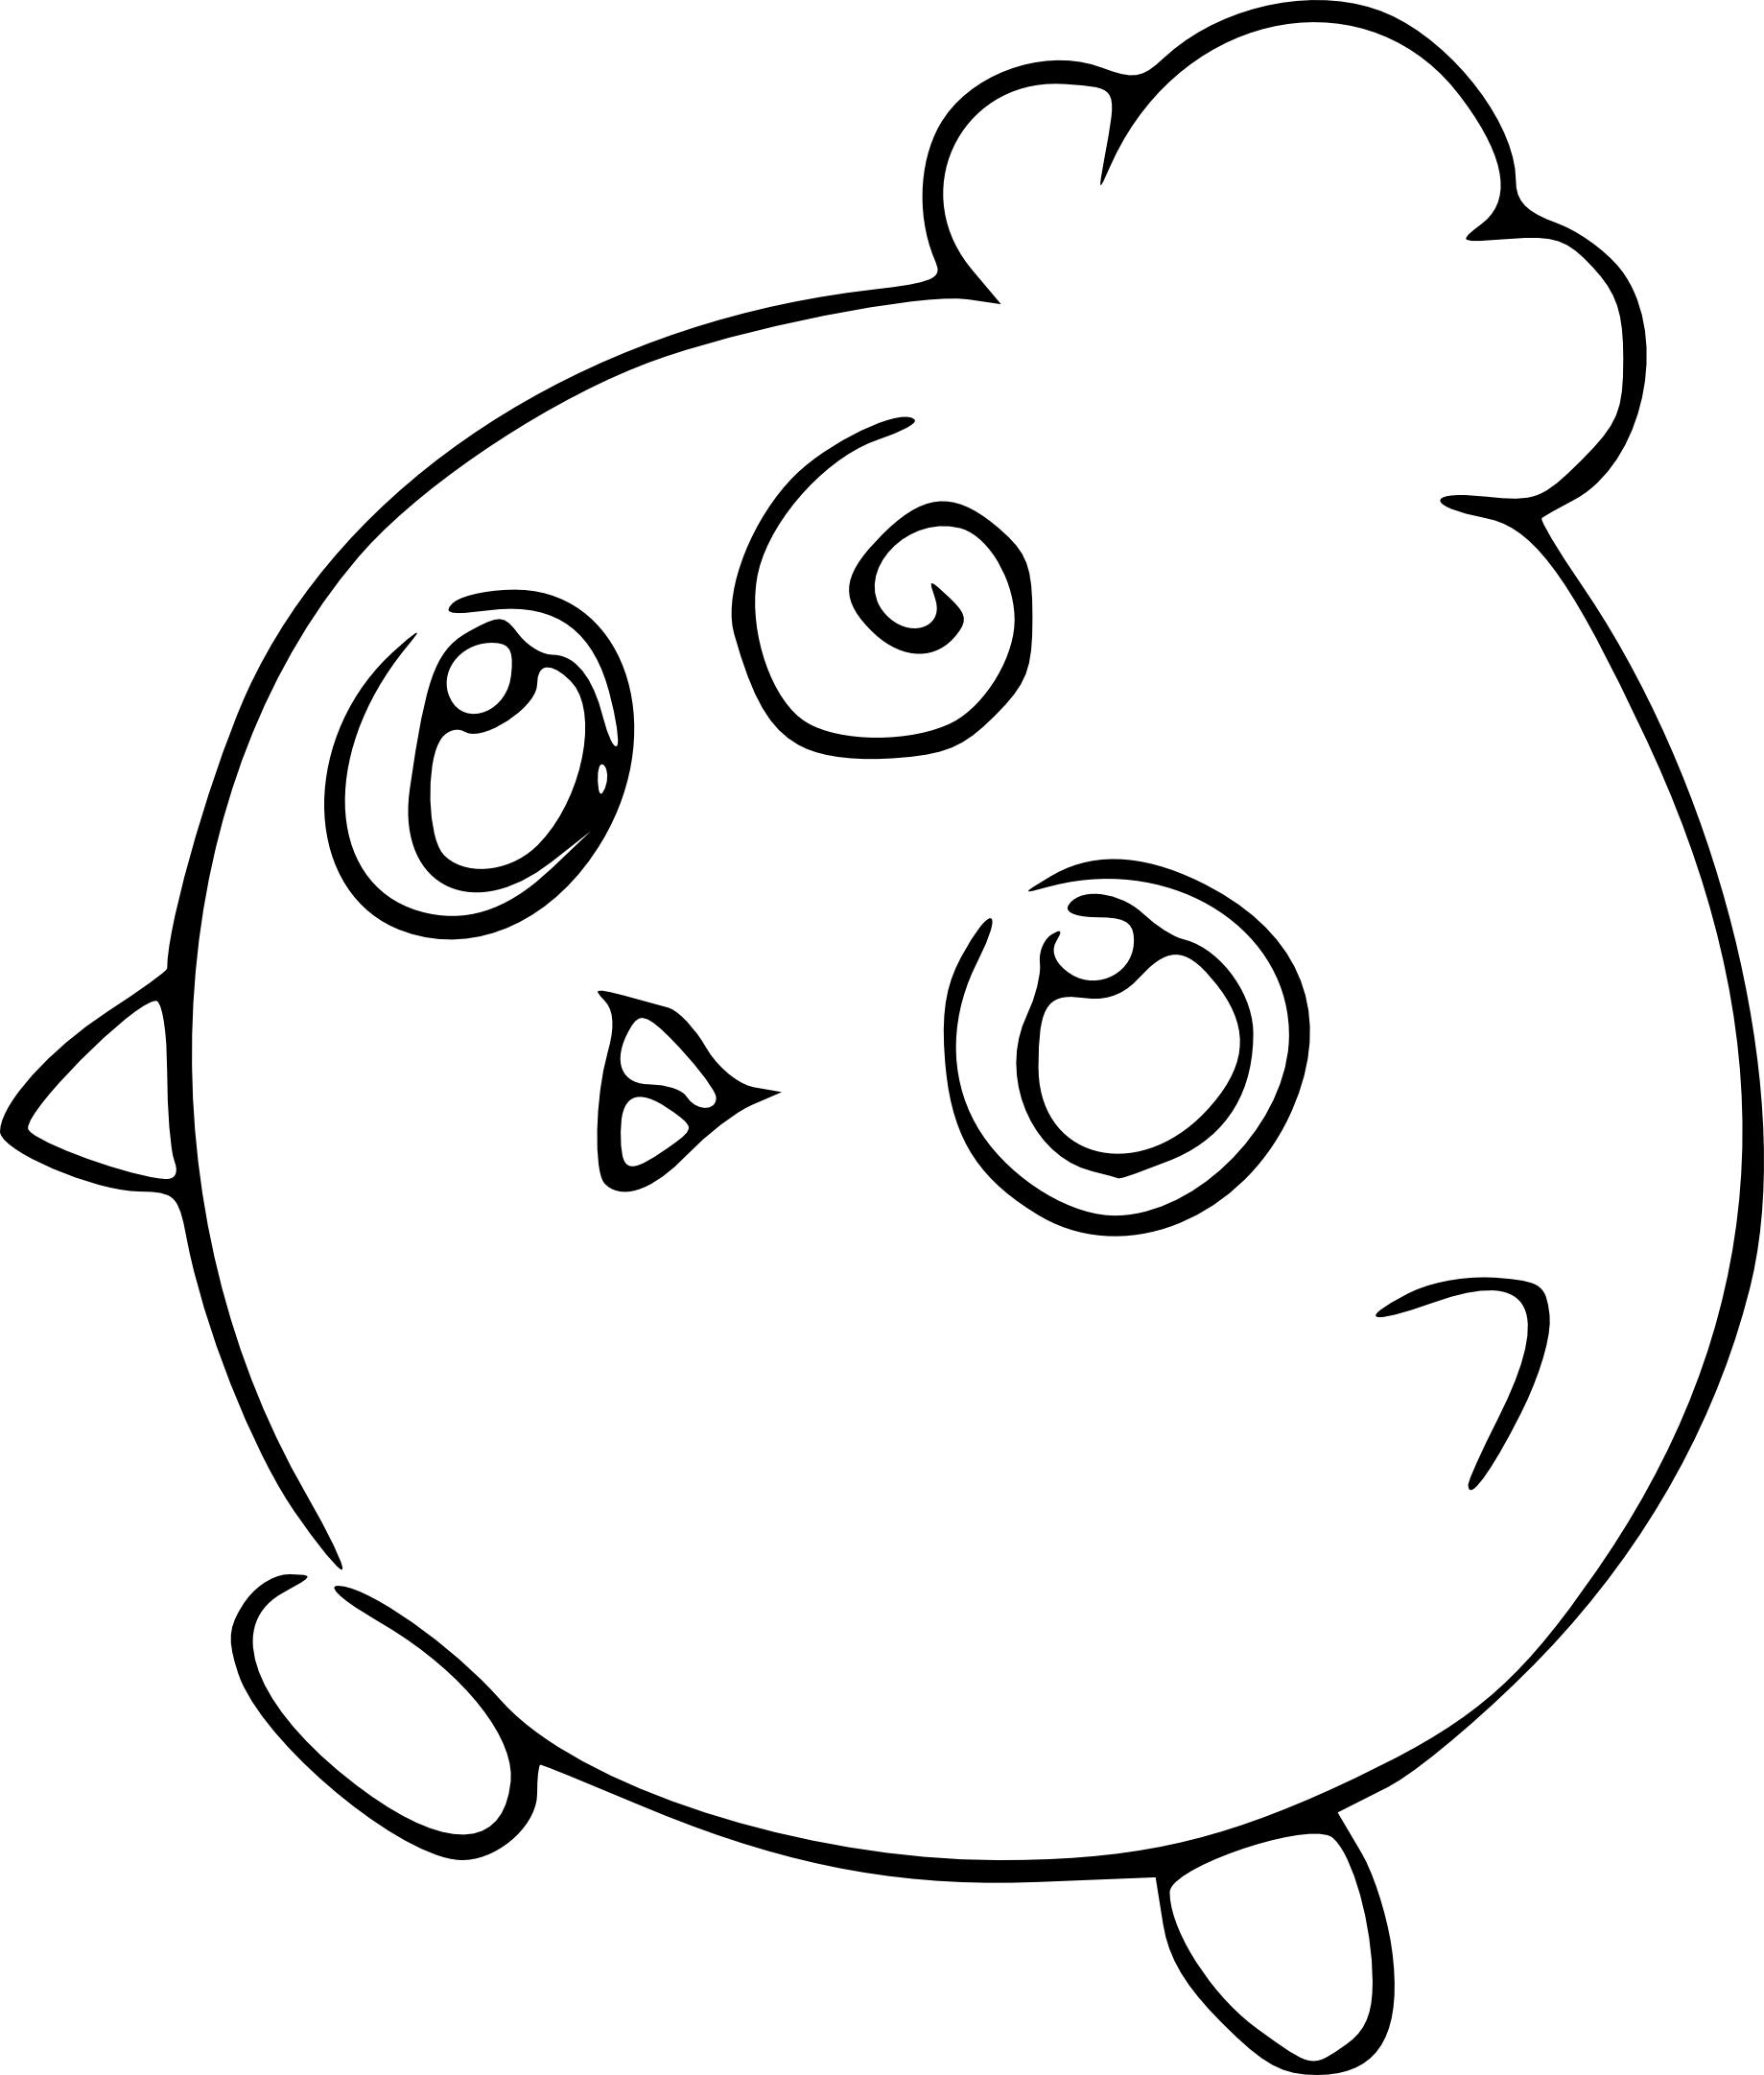 1839x2163 Igglybuff Pokemon Coloring Page